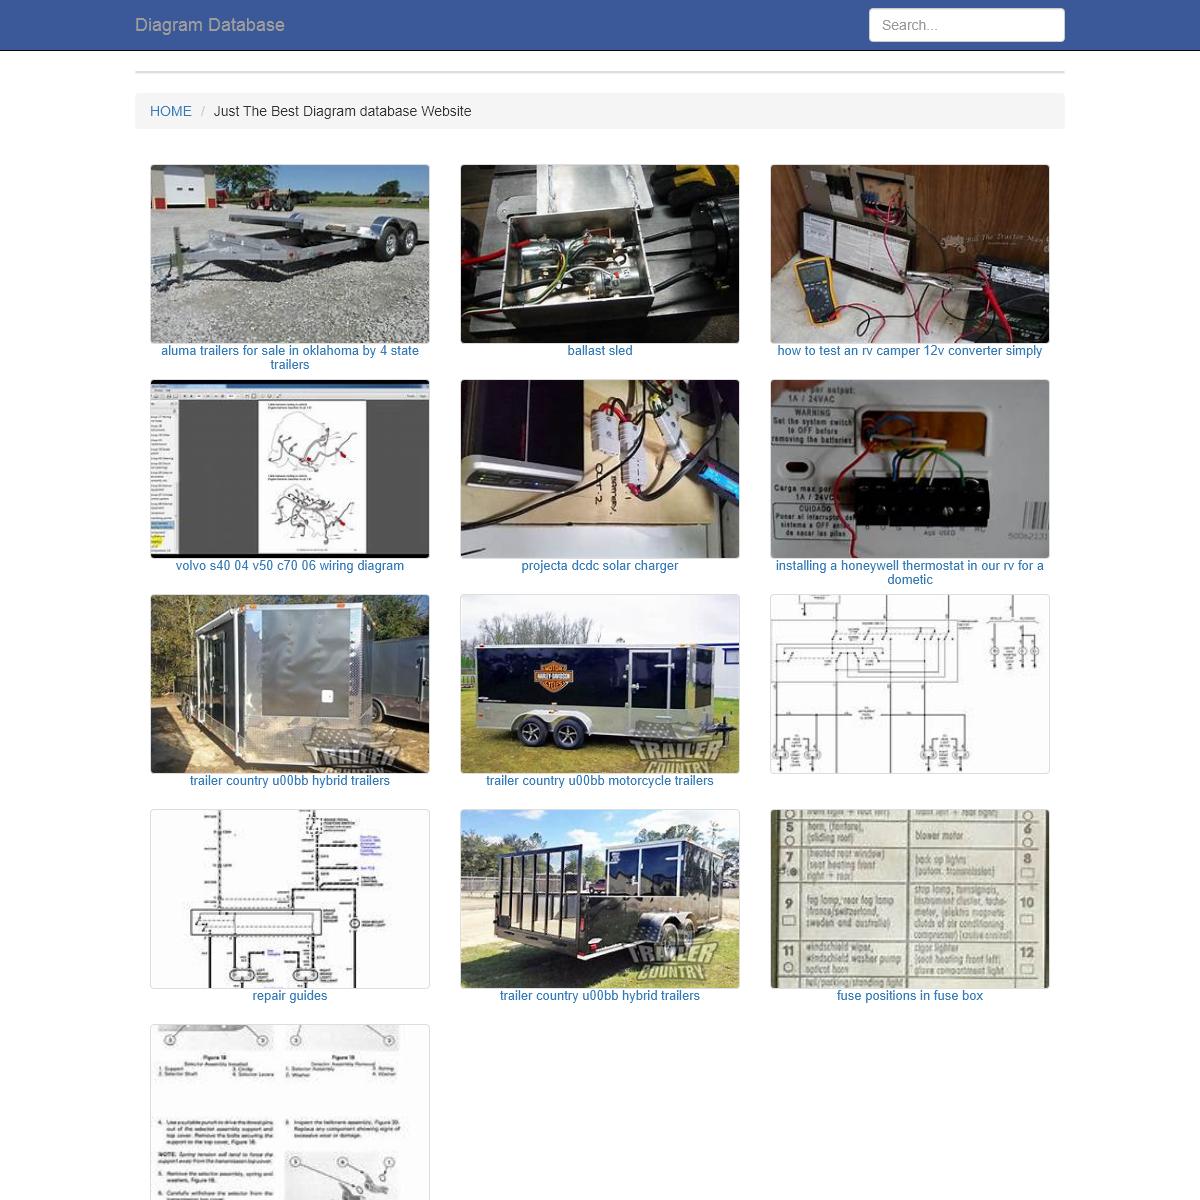 Diagram Database - Just The Best Diagram database Website